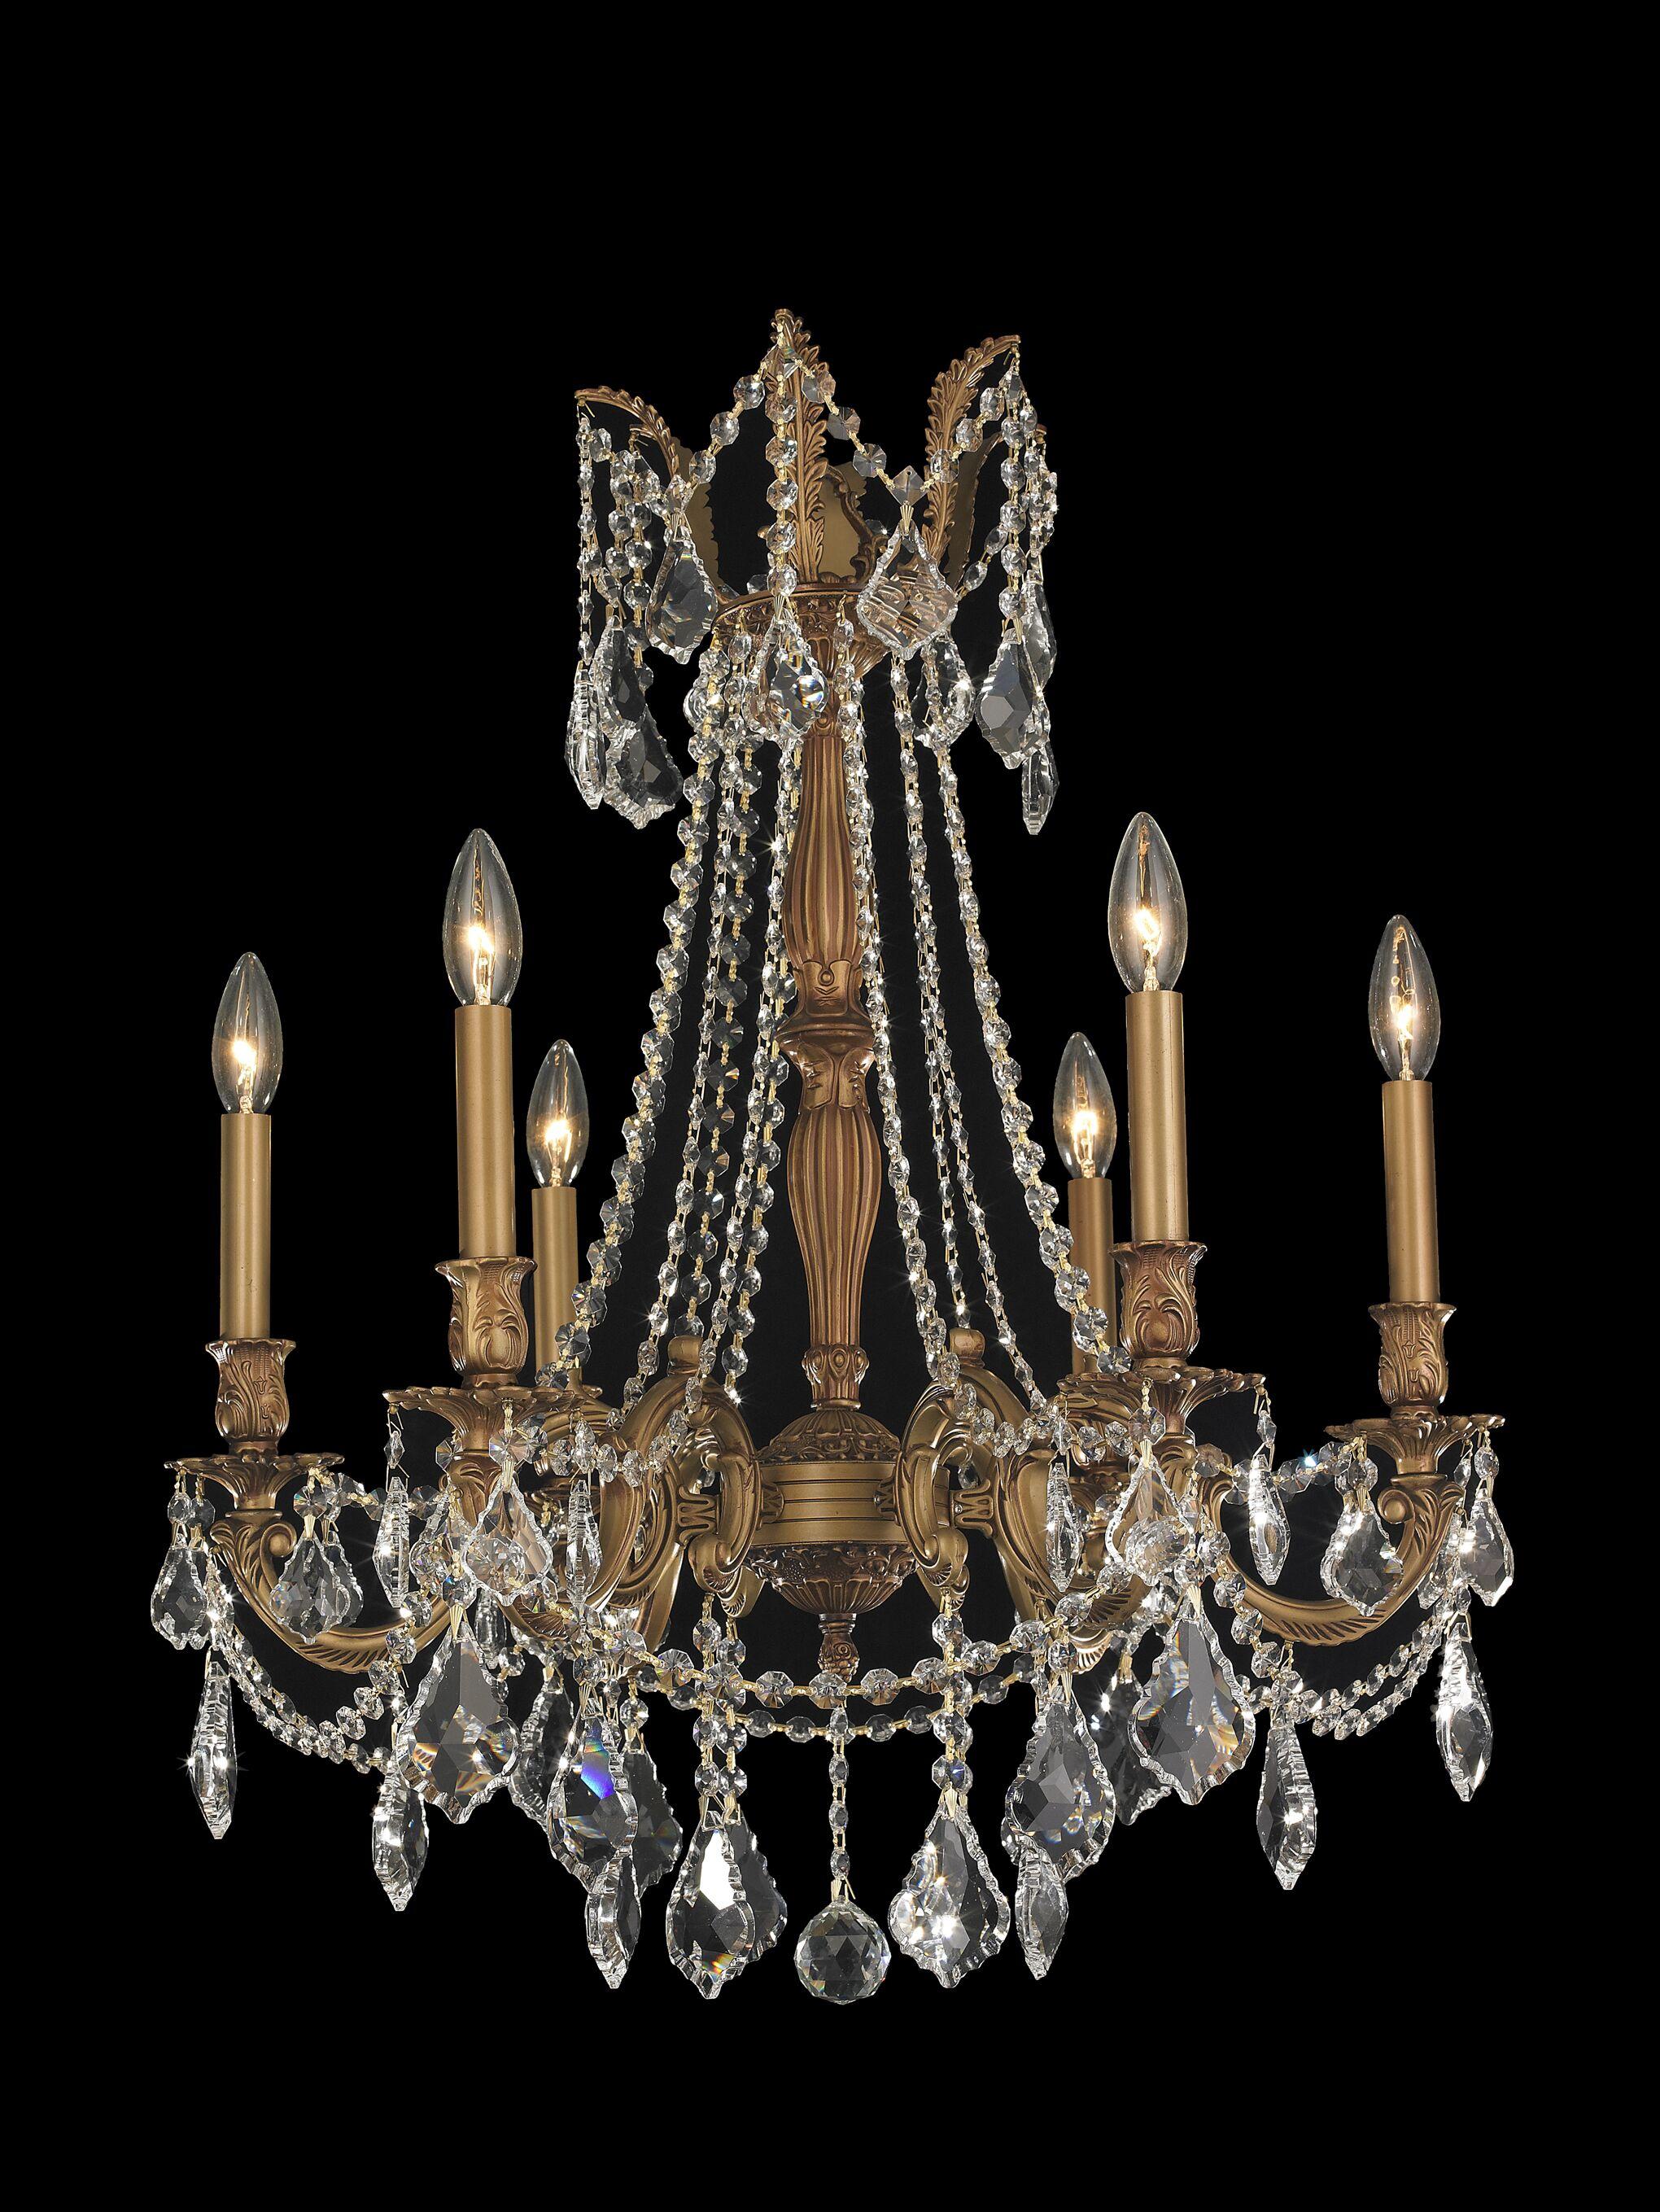 Radtke Traditional 6-Light Candle Style Chandelier